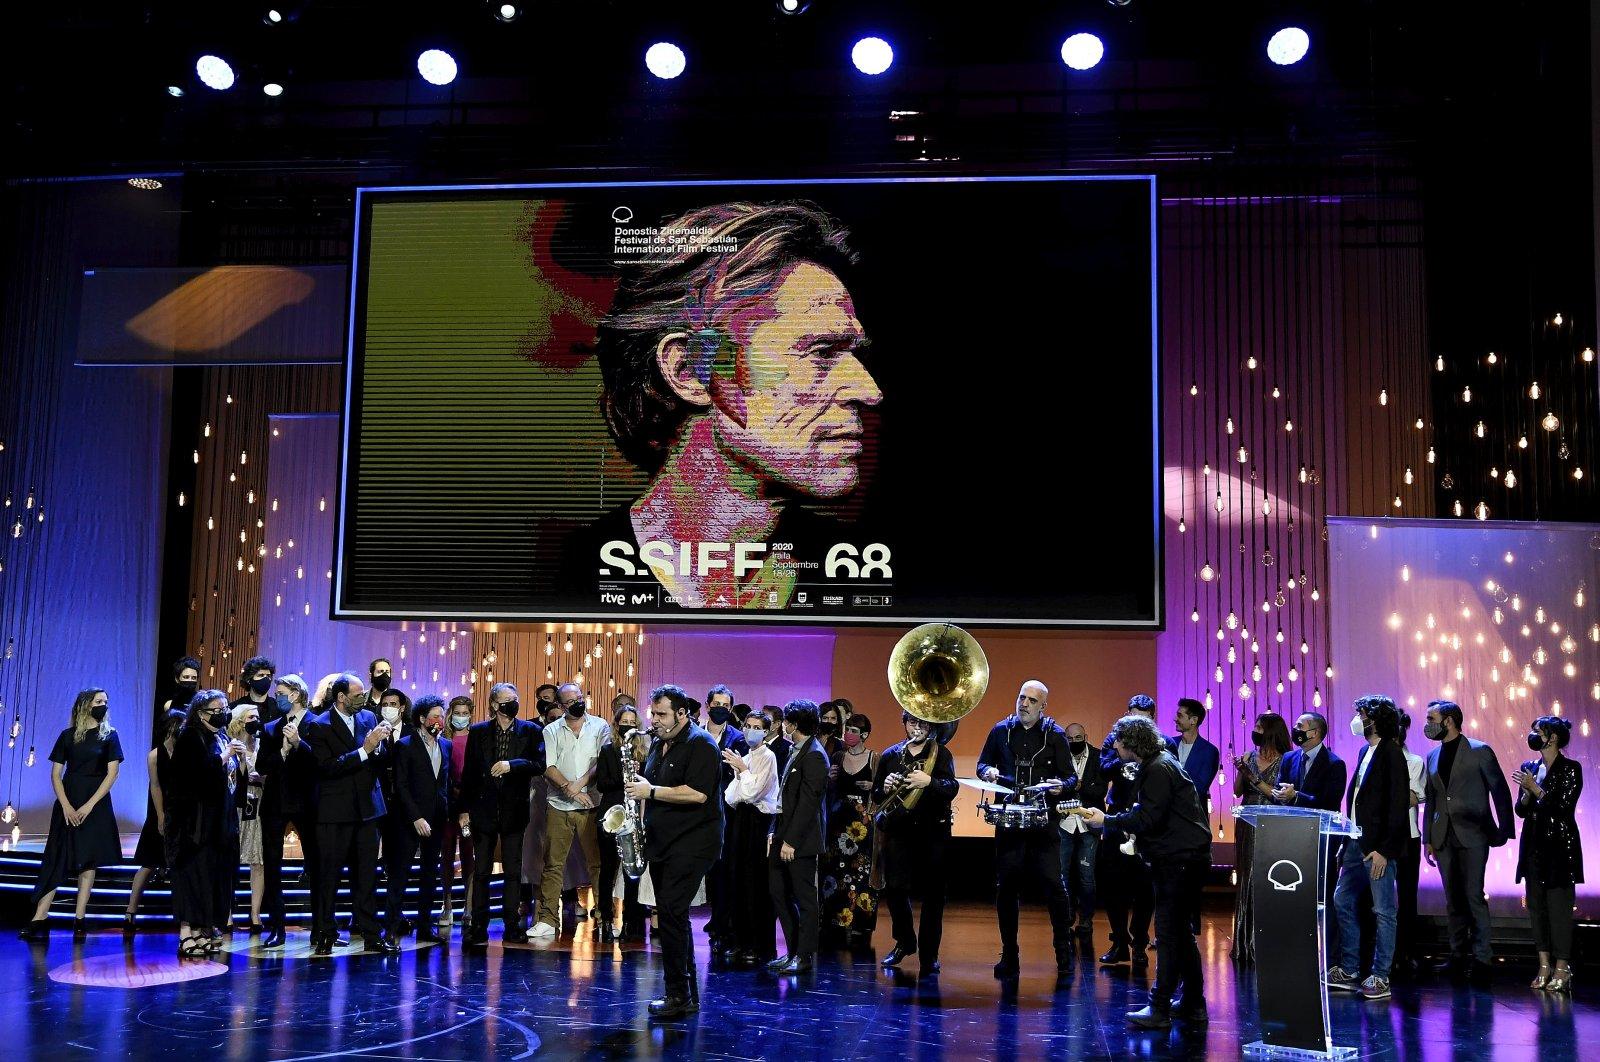 The closing ceremony of the 68th San Sebastian Film Festival, in San Sebastian, Spain,Sept. 26, 2020. (Getty Images)